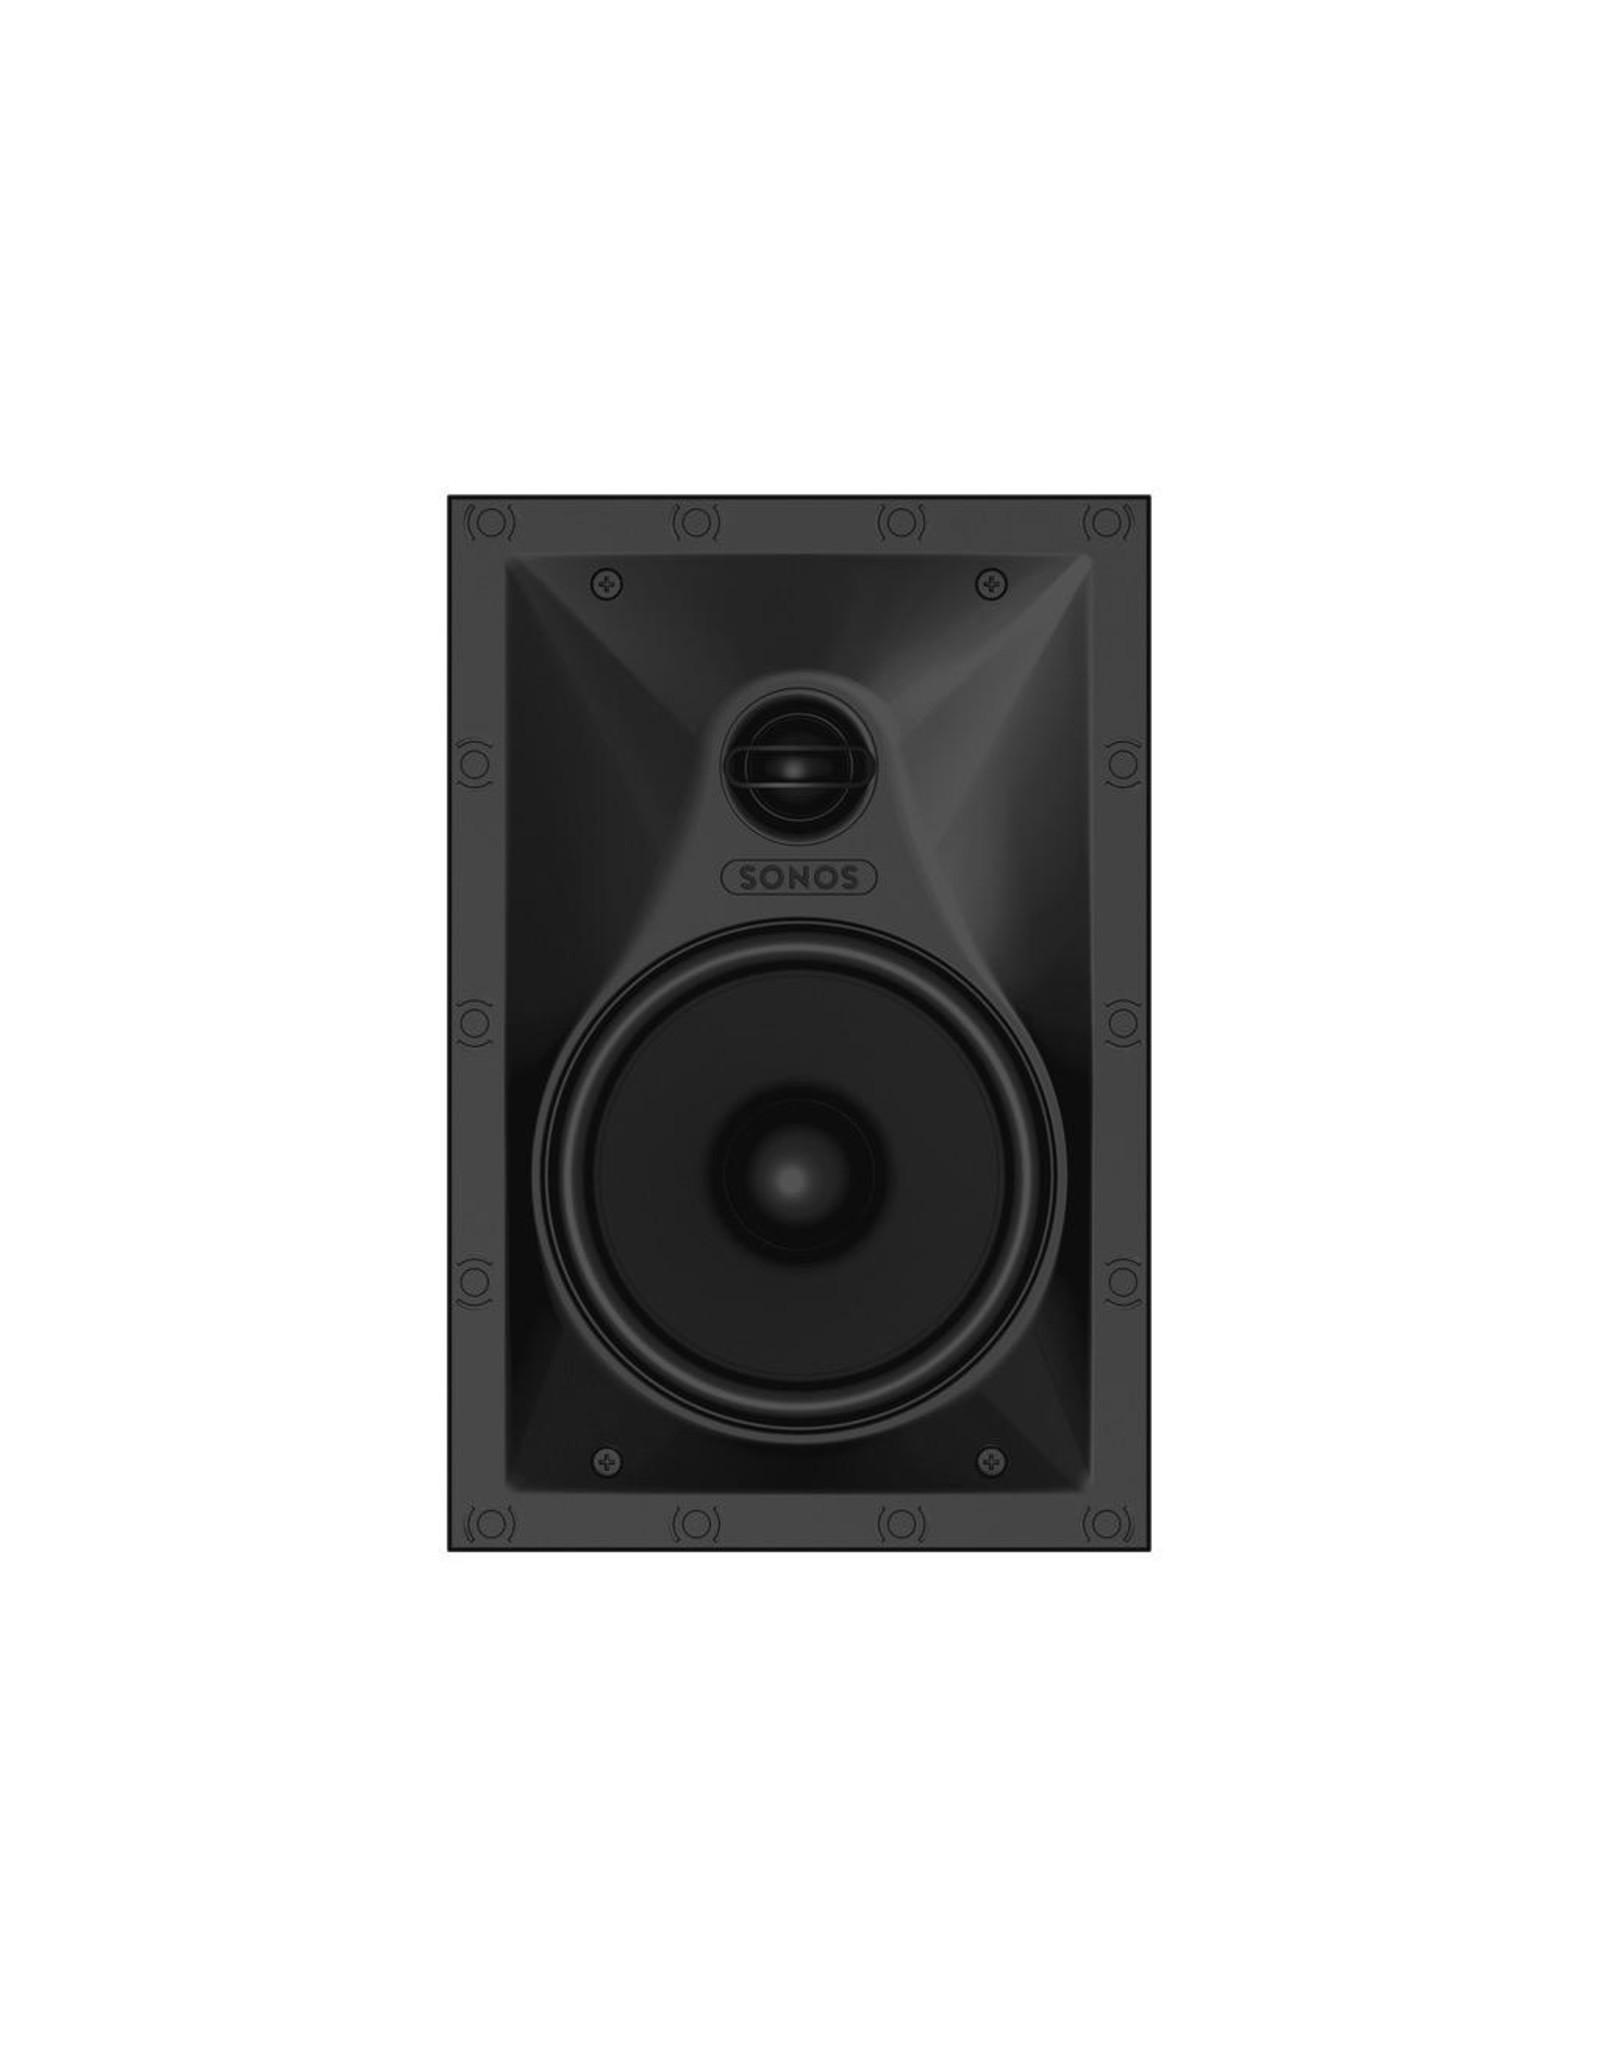 SONOS SONOS In Wall Speakers (pair) WHITE